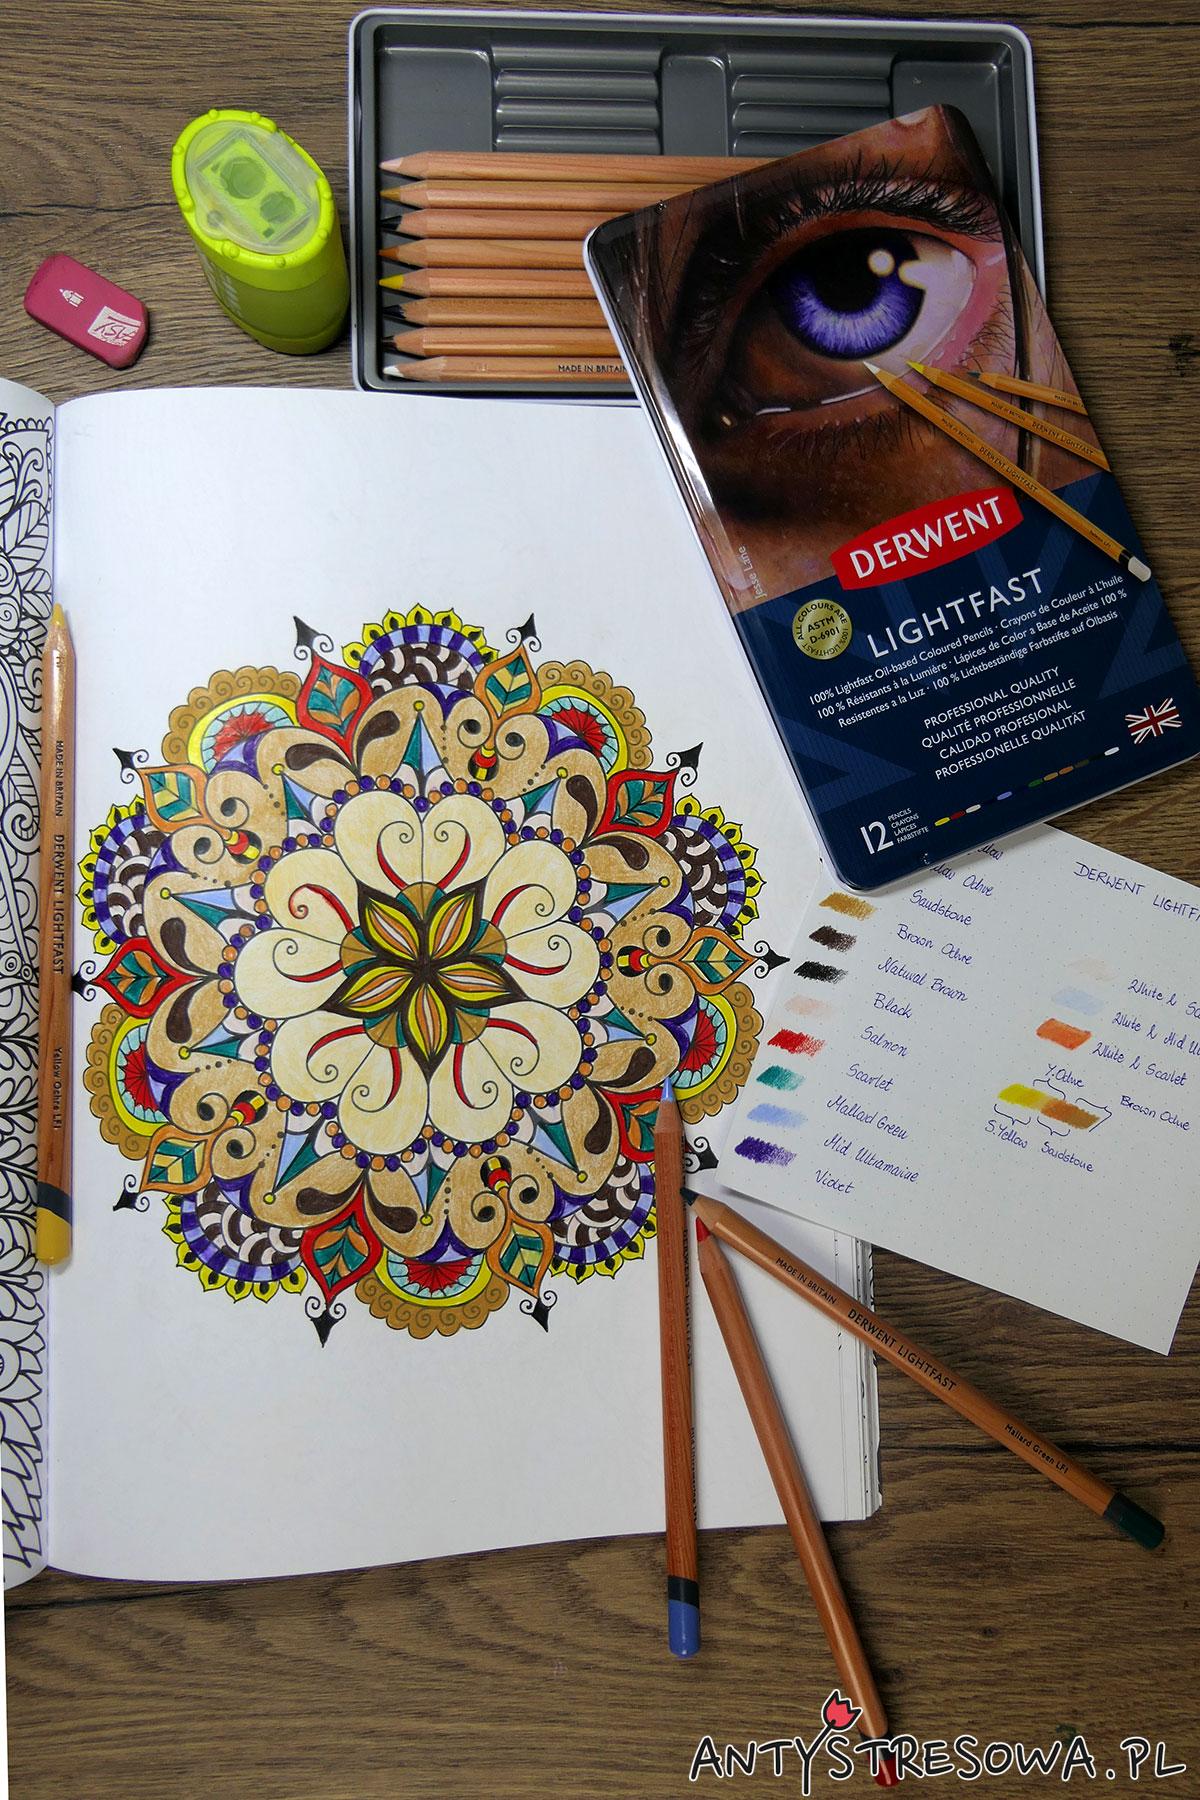 Derwent Lightfast, Adult Colouring Book